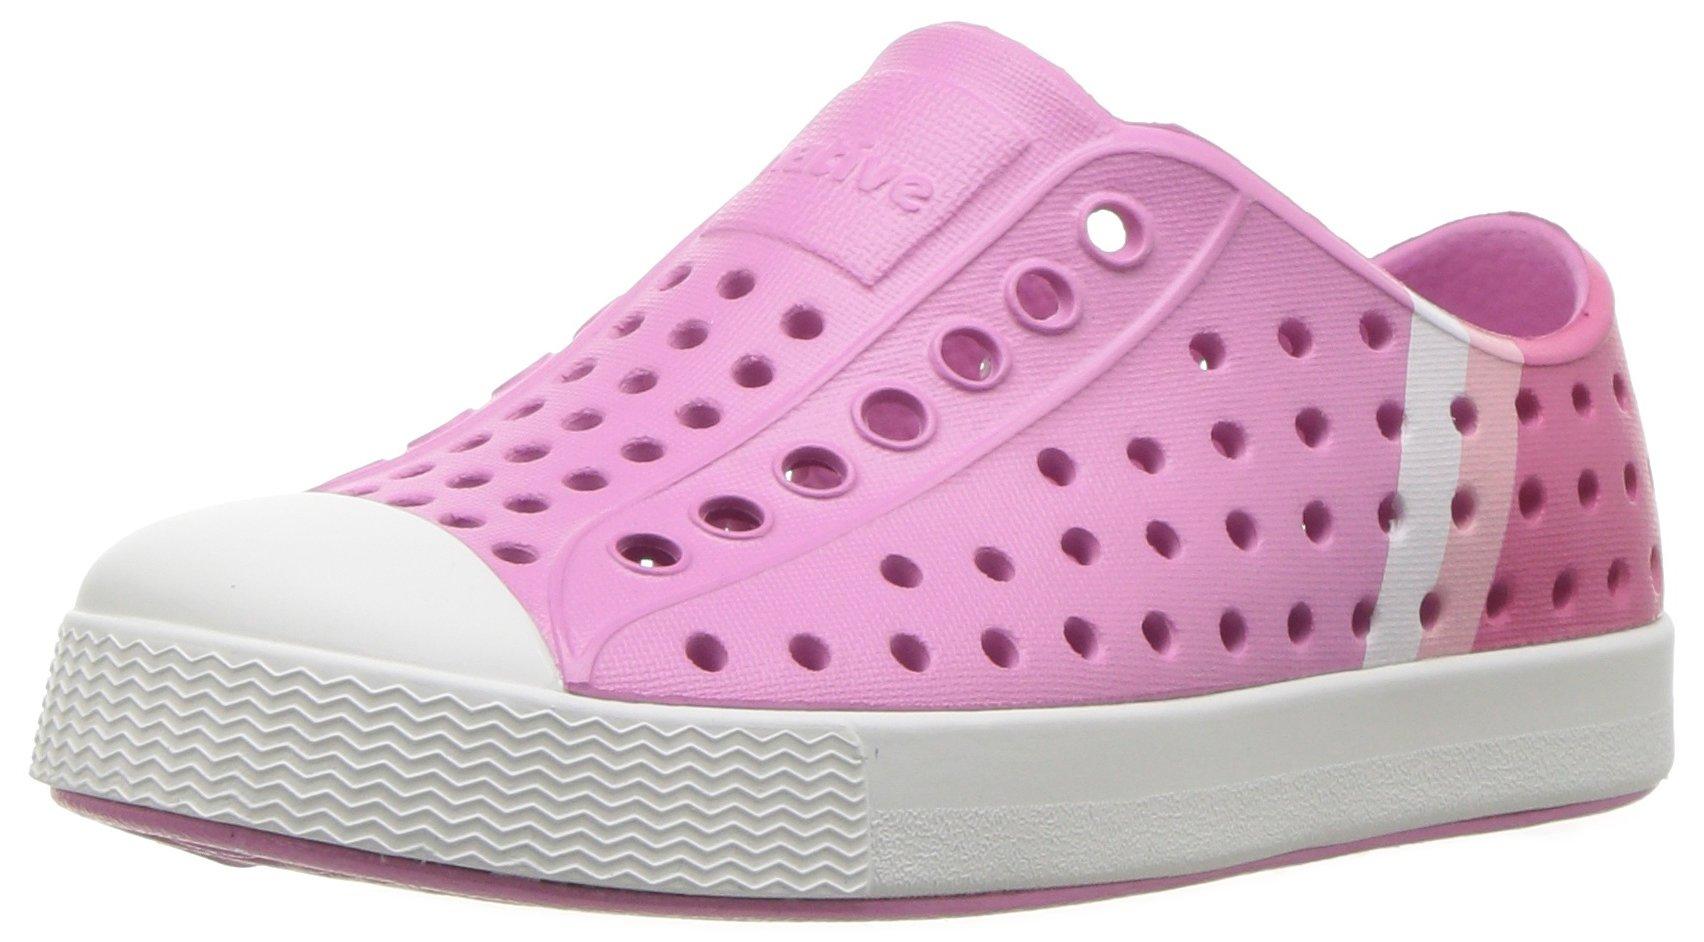 Native Kids' Jefferson Block Child Water Shoe, Malibu Pink/Shell White/Gradient Block Print, 6 Medium US Toddler